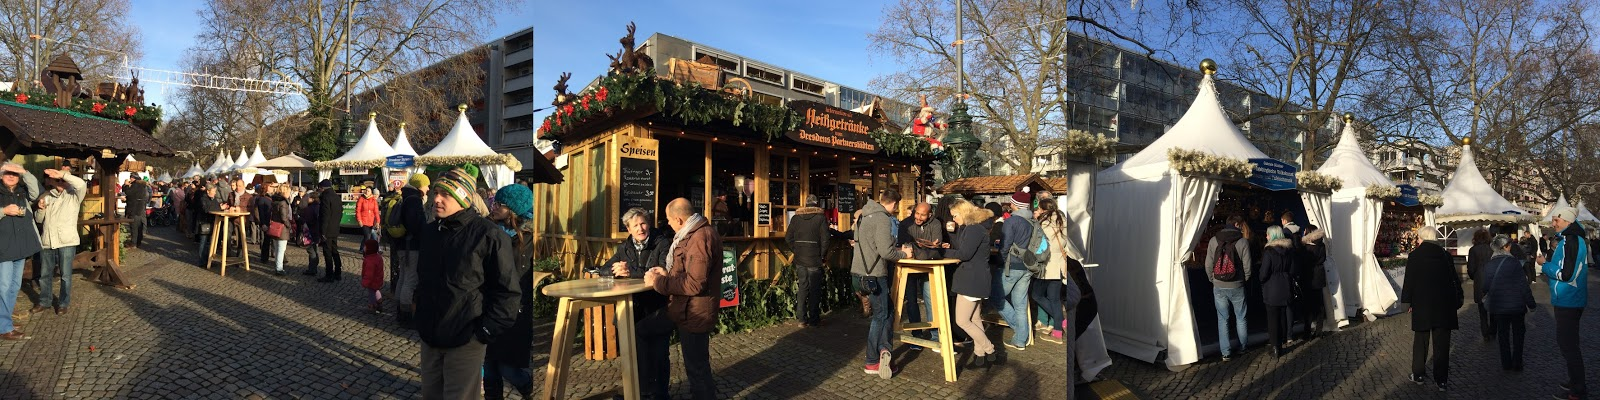 Dashka Hops  Christmas markets in Dresden  Vánoční trhy v Drážďanech ... 3c44d3ceb7b